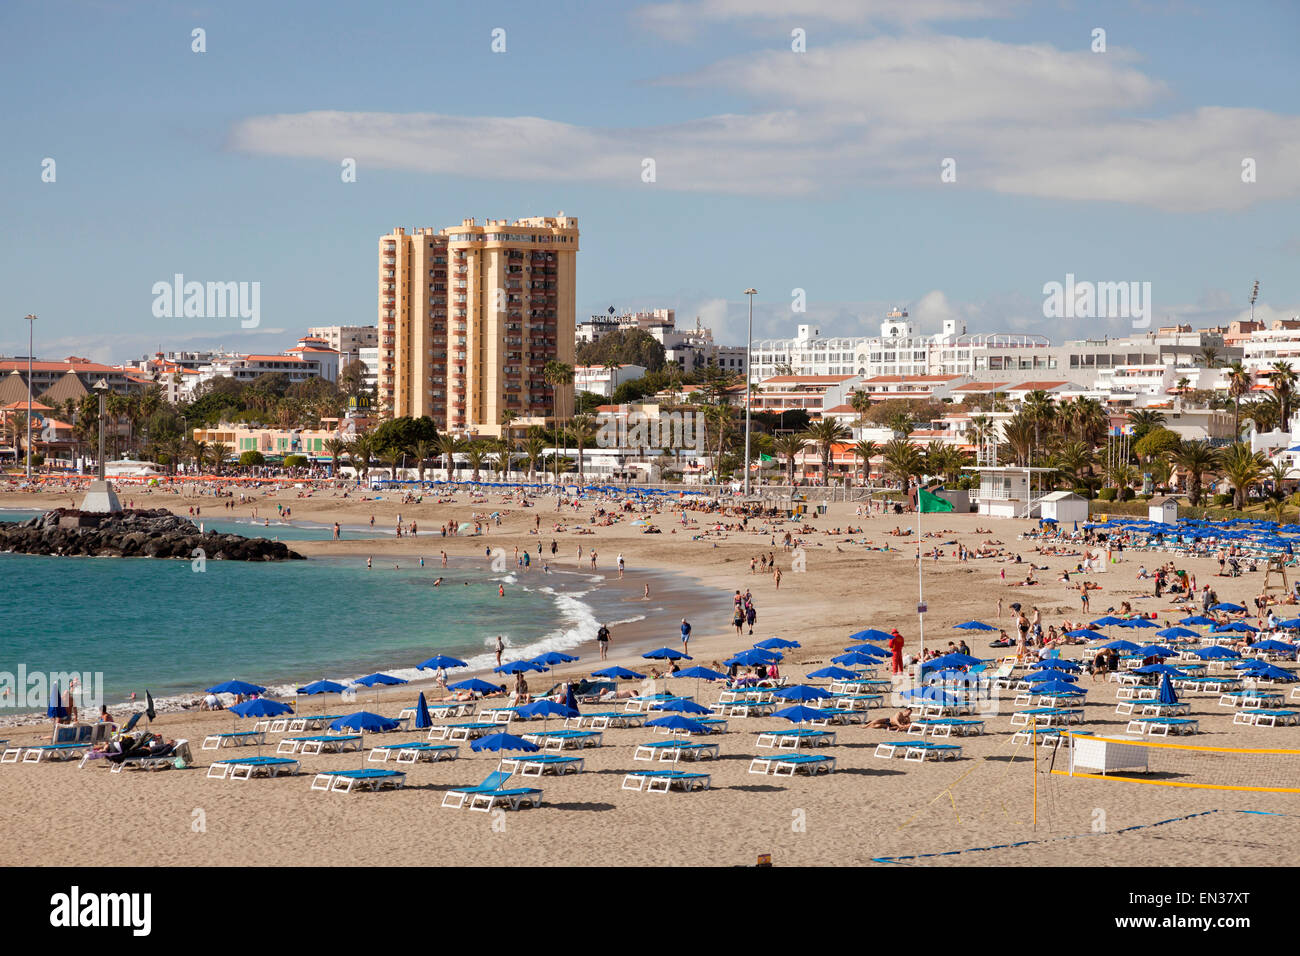 Tenerife Resort Hotels